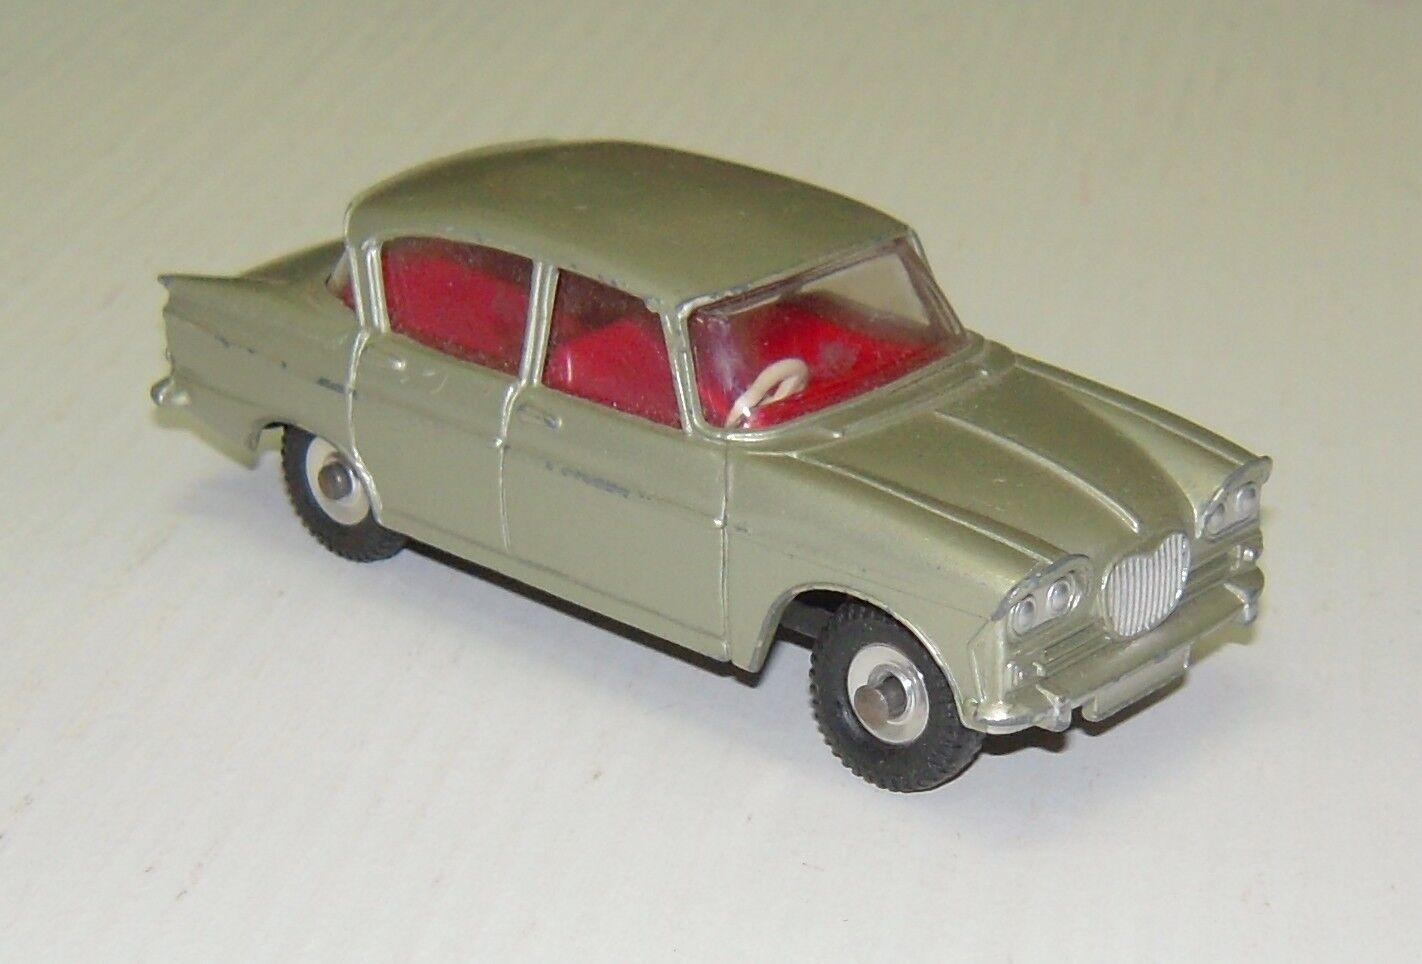 SINGER VOGUE 145 Dinky Juguetes Modellino Auto Anni '60. Scala 1 43. Vintage (8)